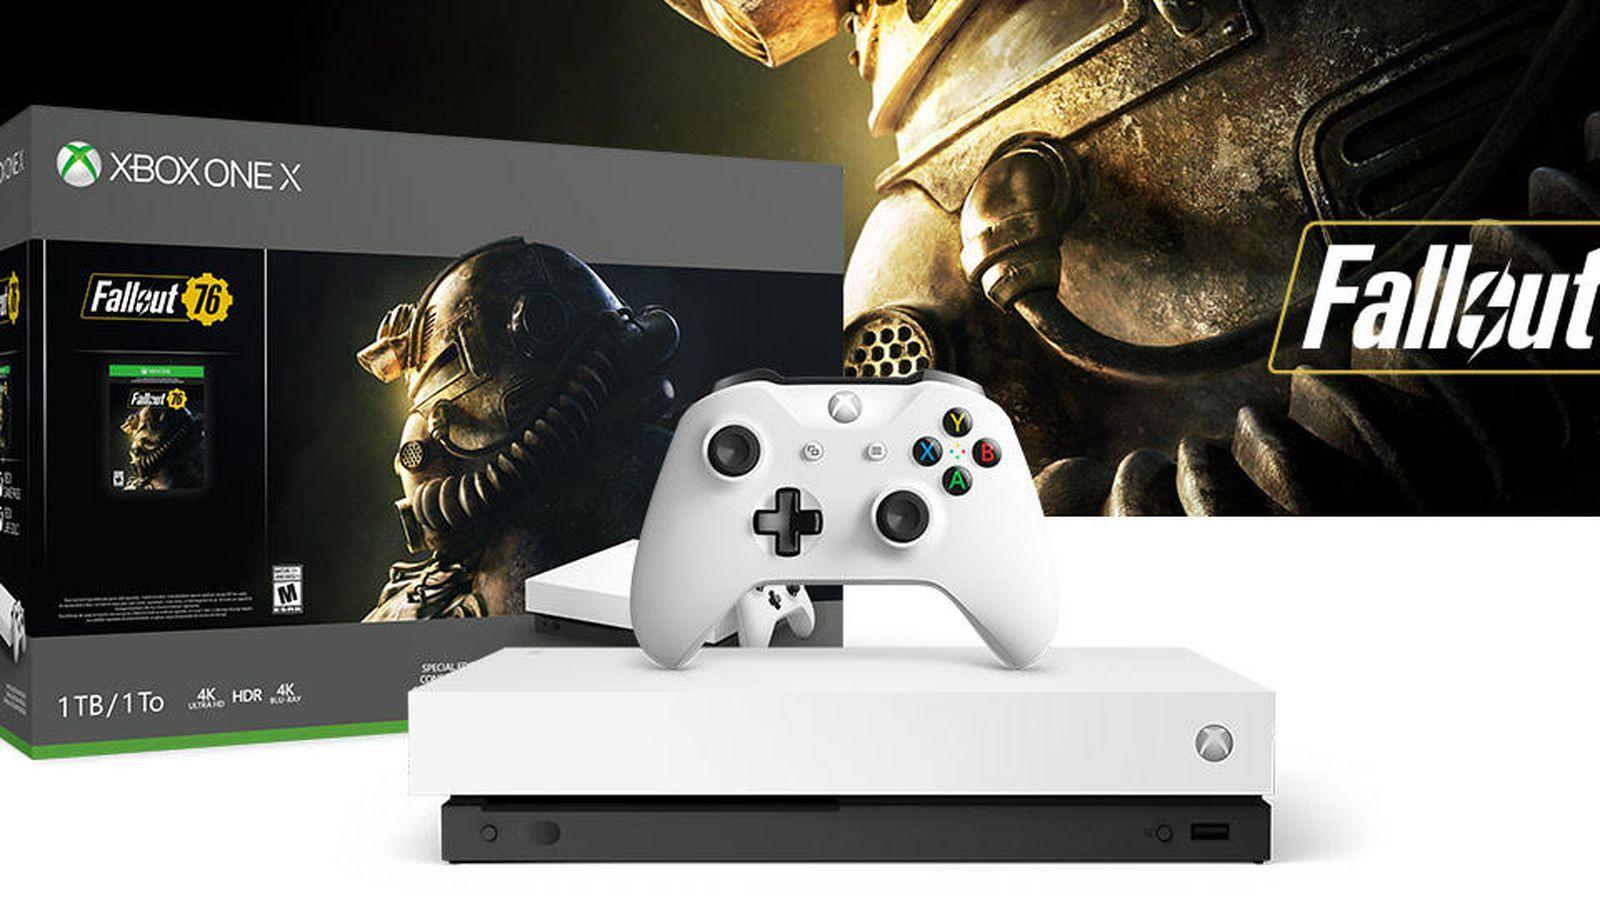 Xbox One X Fallout76 Blanca !!!